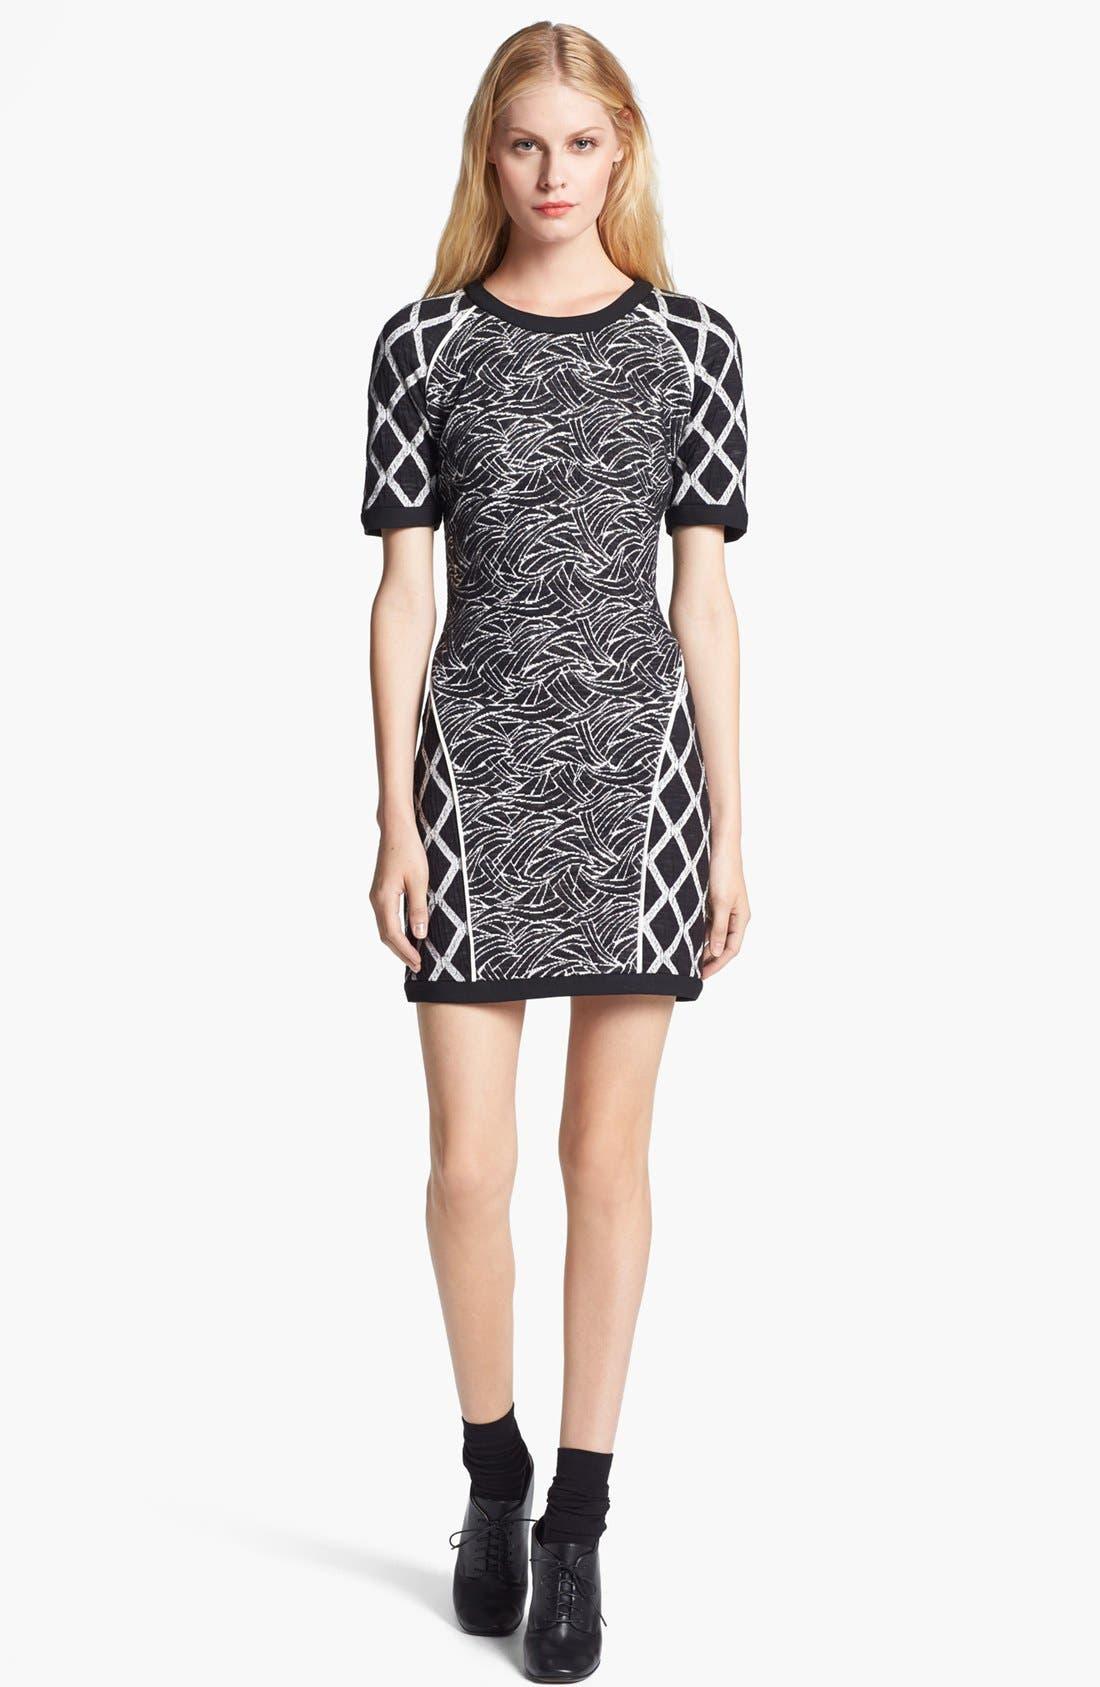 Main Image - Elizabeth and James 'Argon' Wave Knit Dress